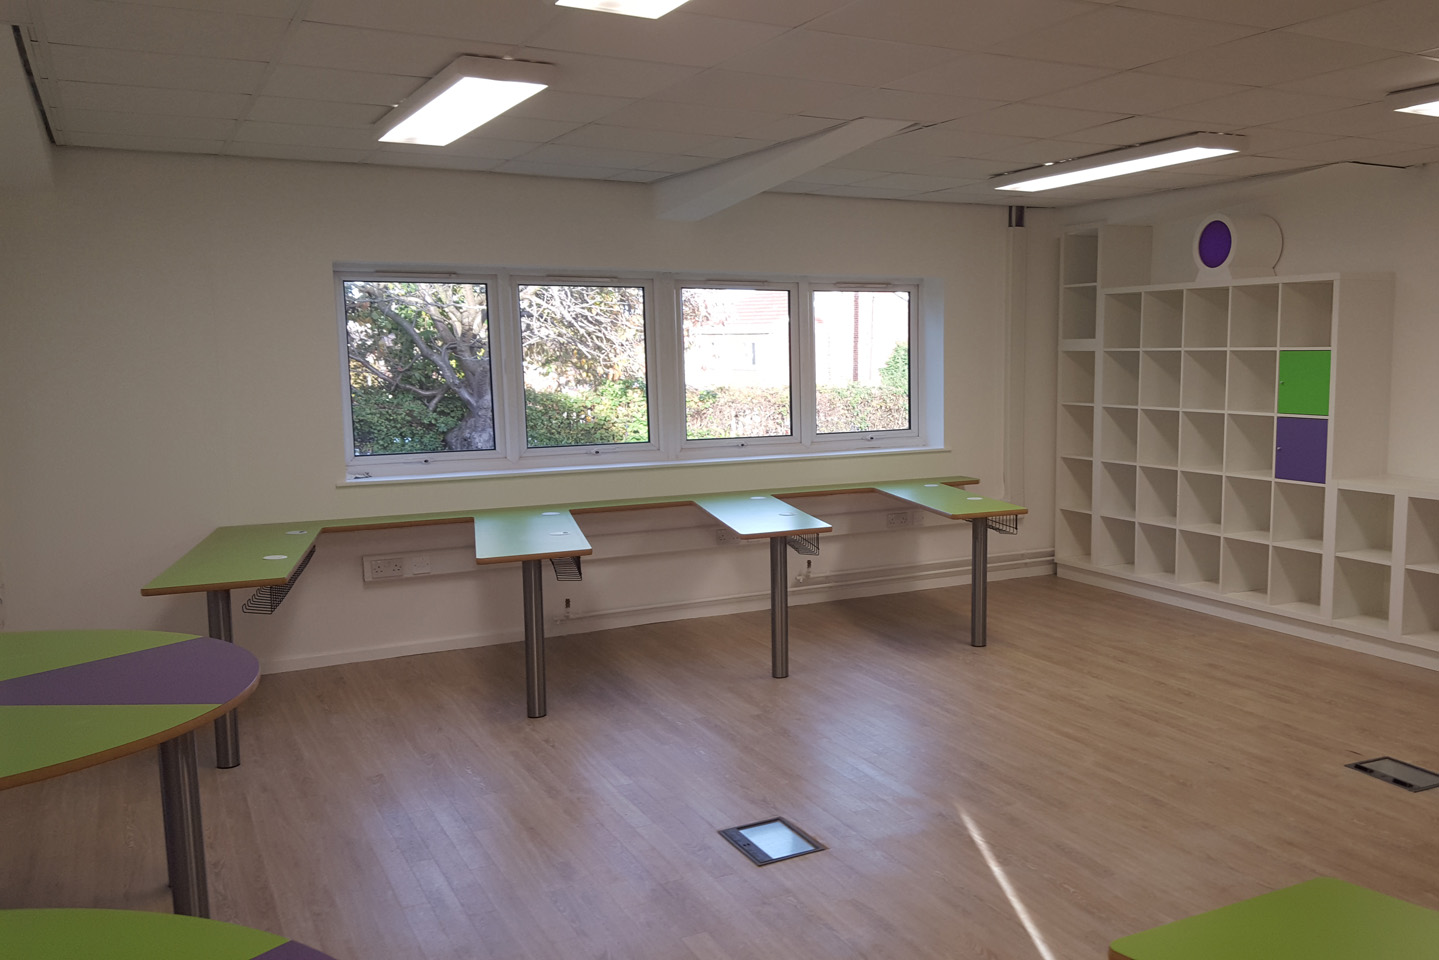 Primary School Classroom Upgrade, Rotherham